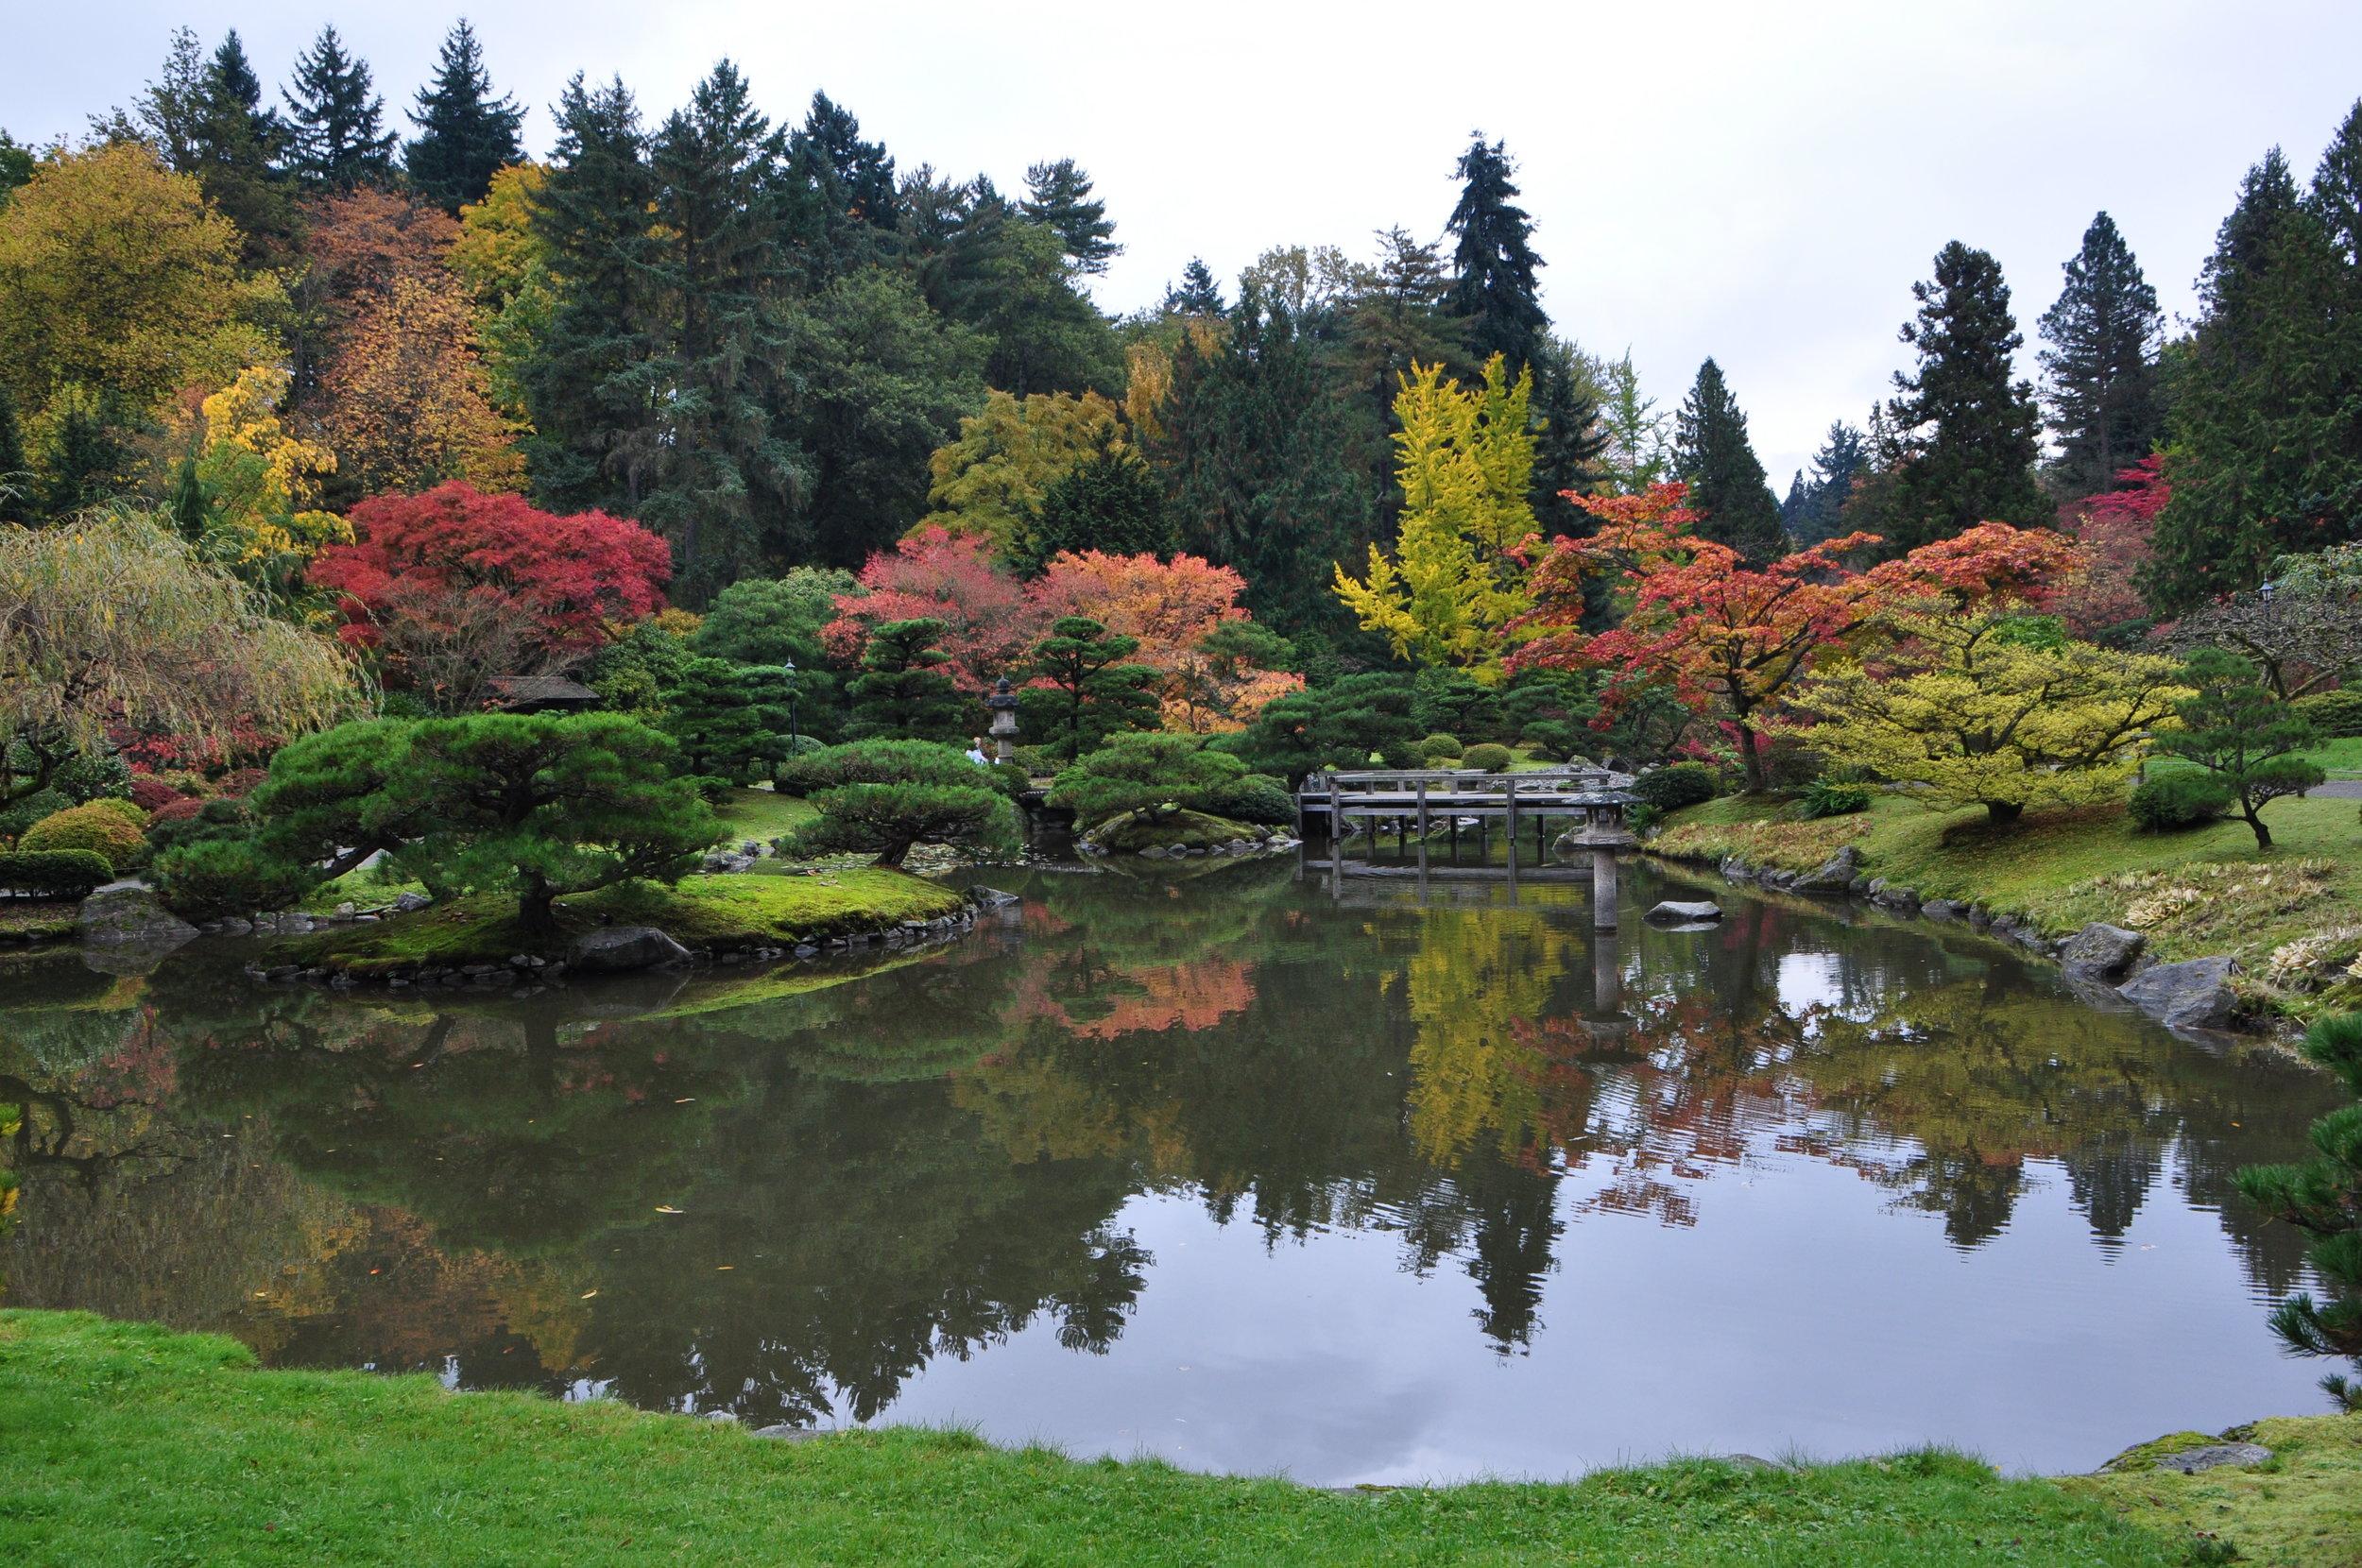 Seattle_Japanese_garden_2011_05.jpg